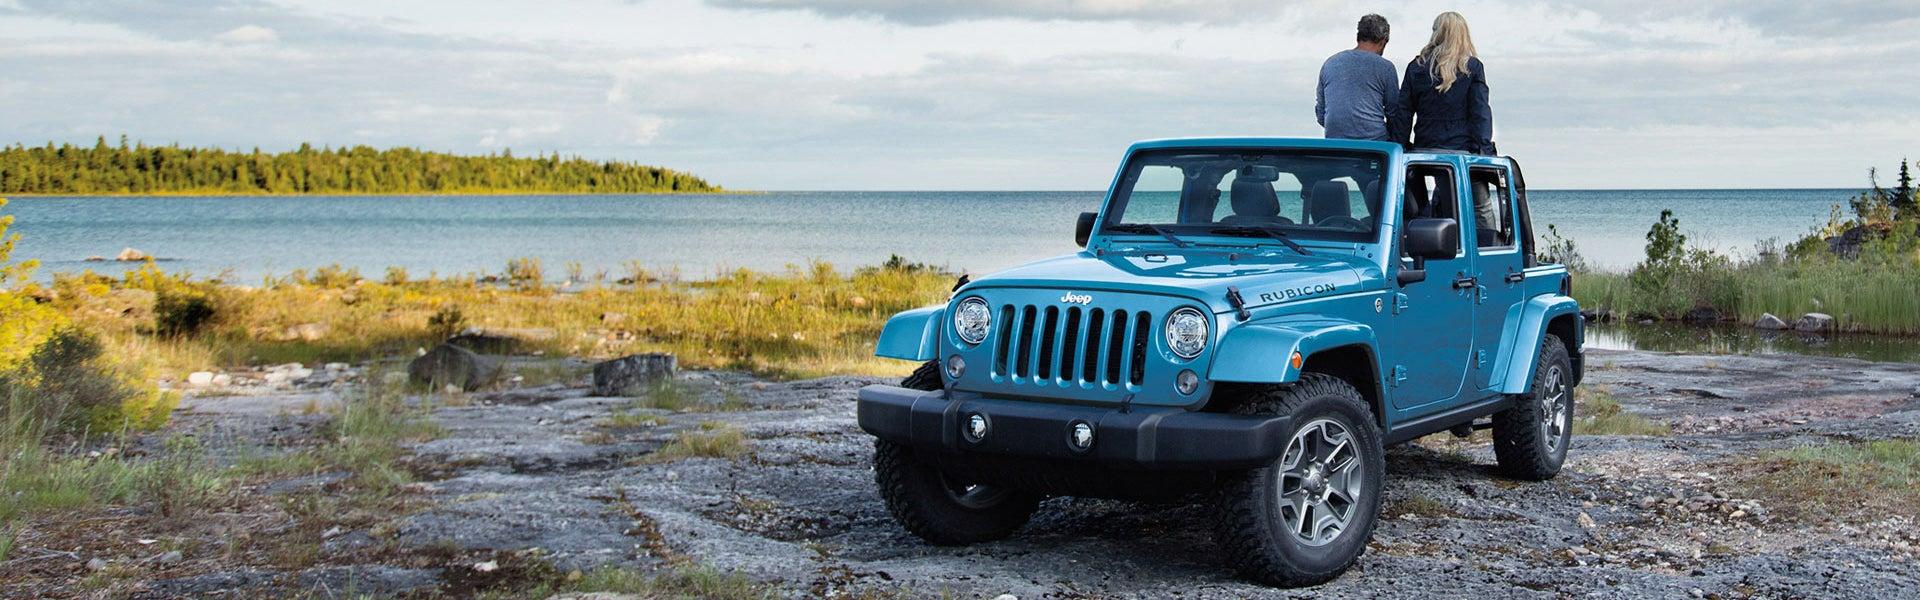 Jeep Dealers In Ky >> New 2018 Jeep Wrangler Jl Jeep Dealer In Louisville Ky